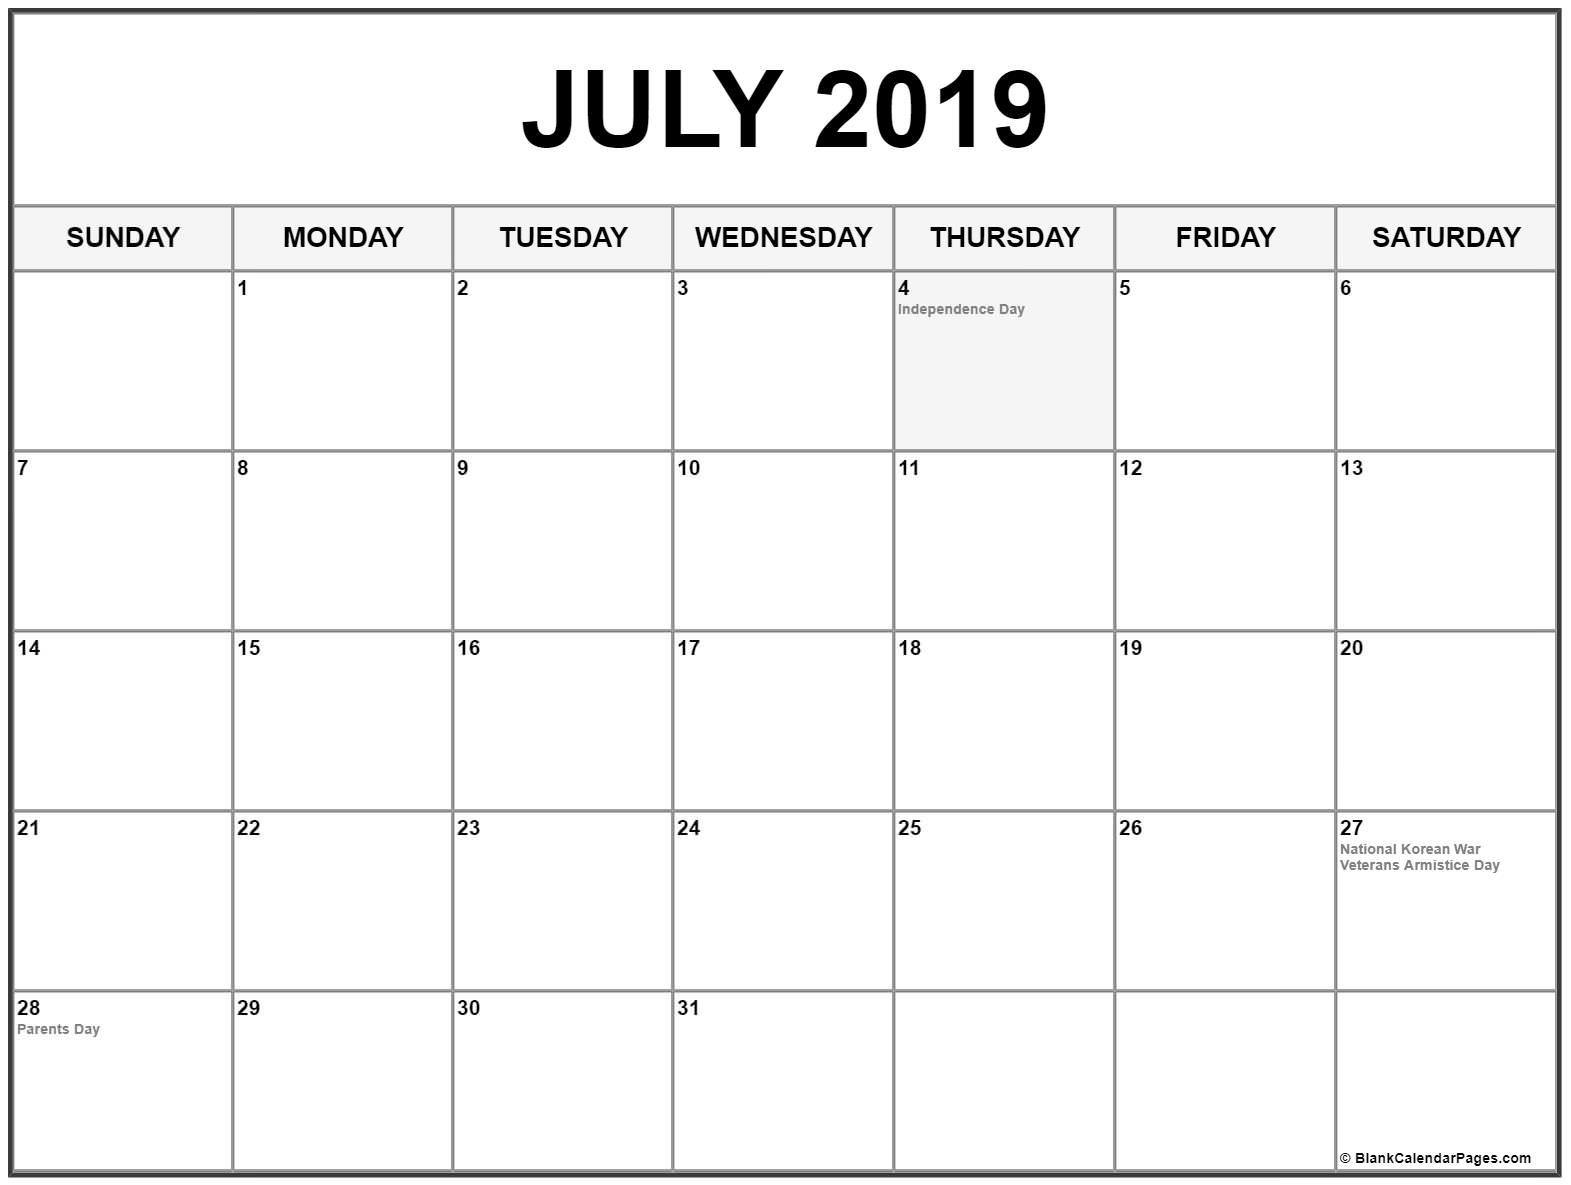 July 2019 Calendar With Holidays #july #july2019 #julycalendar2019 with Blank Calendar Print-Outs Fill In With Holidays